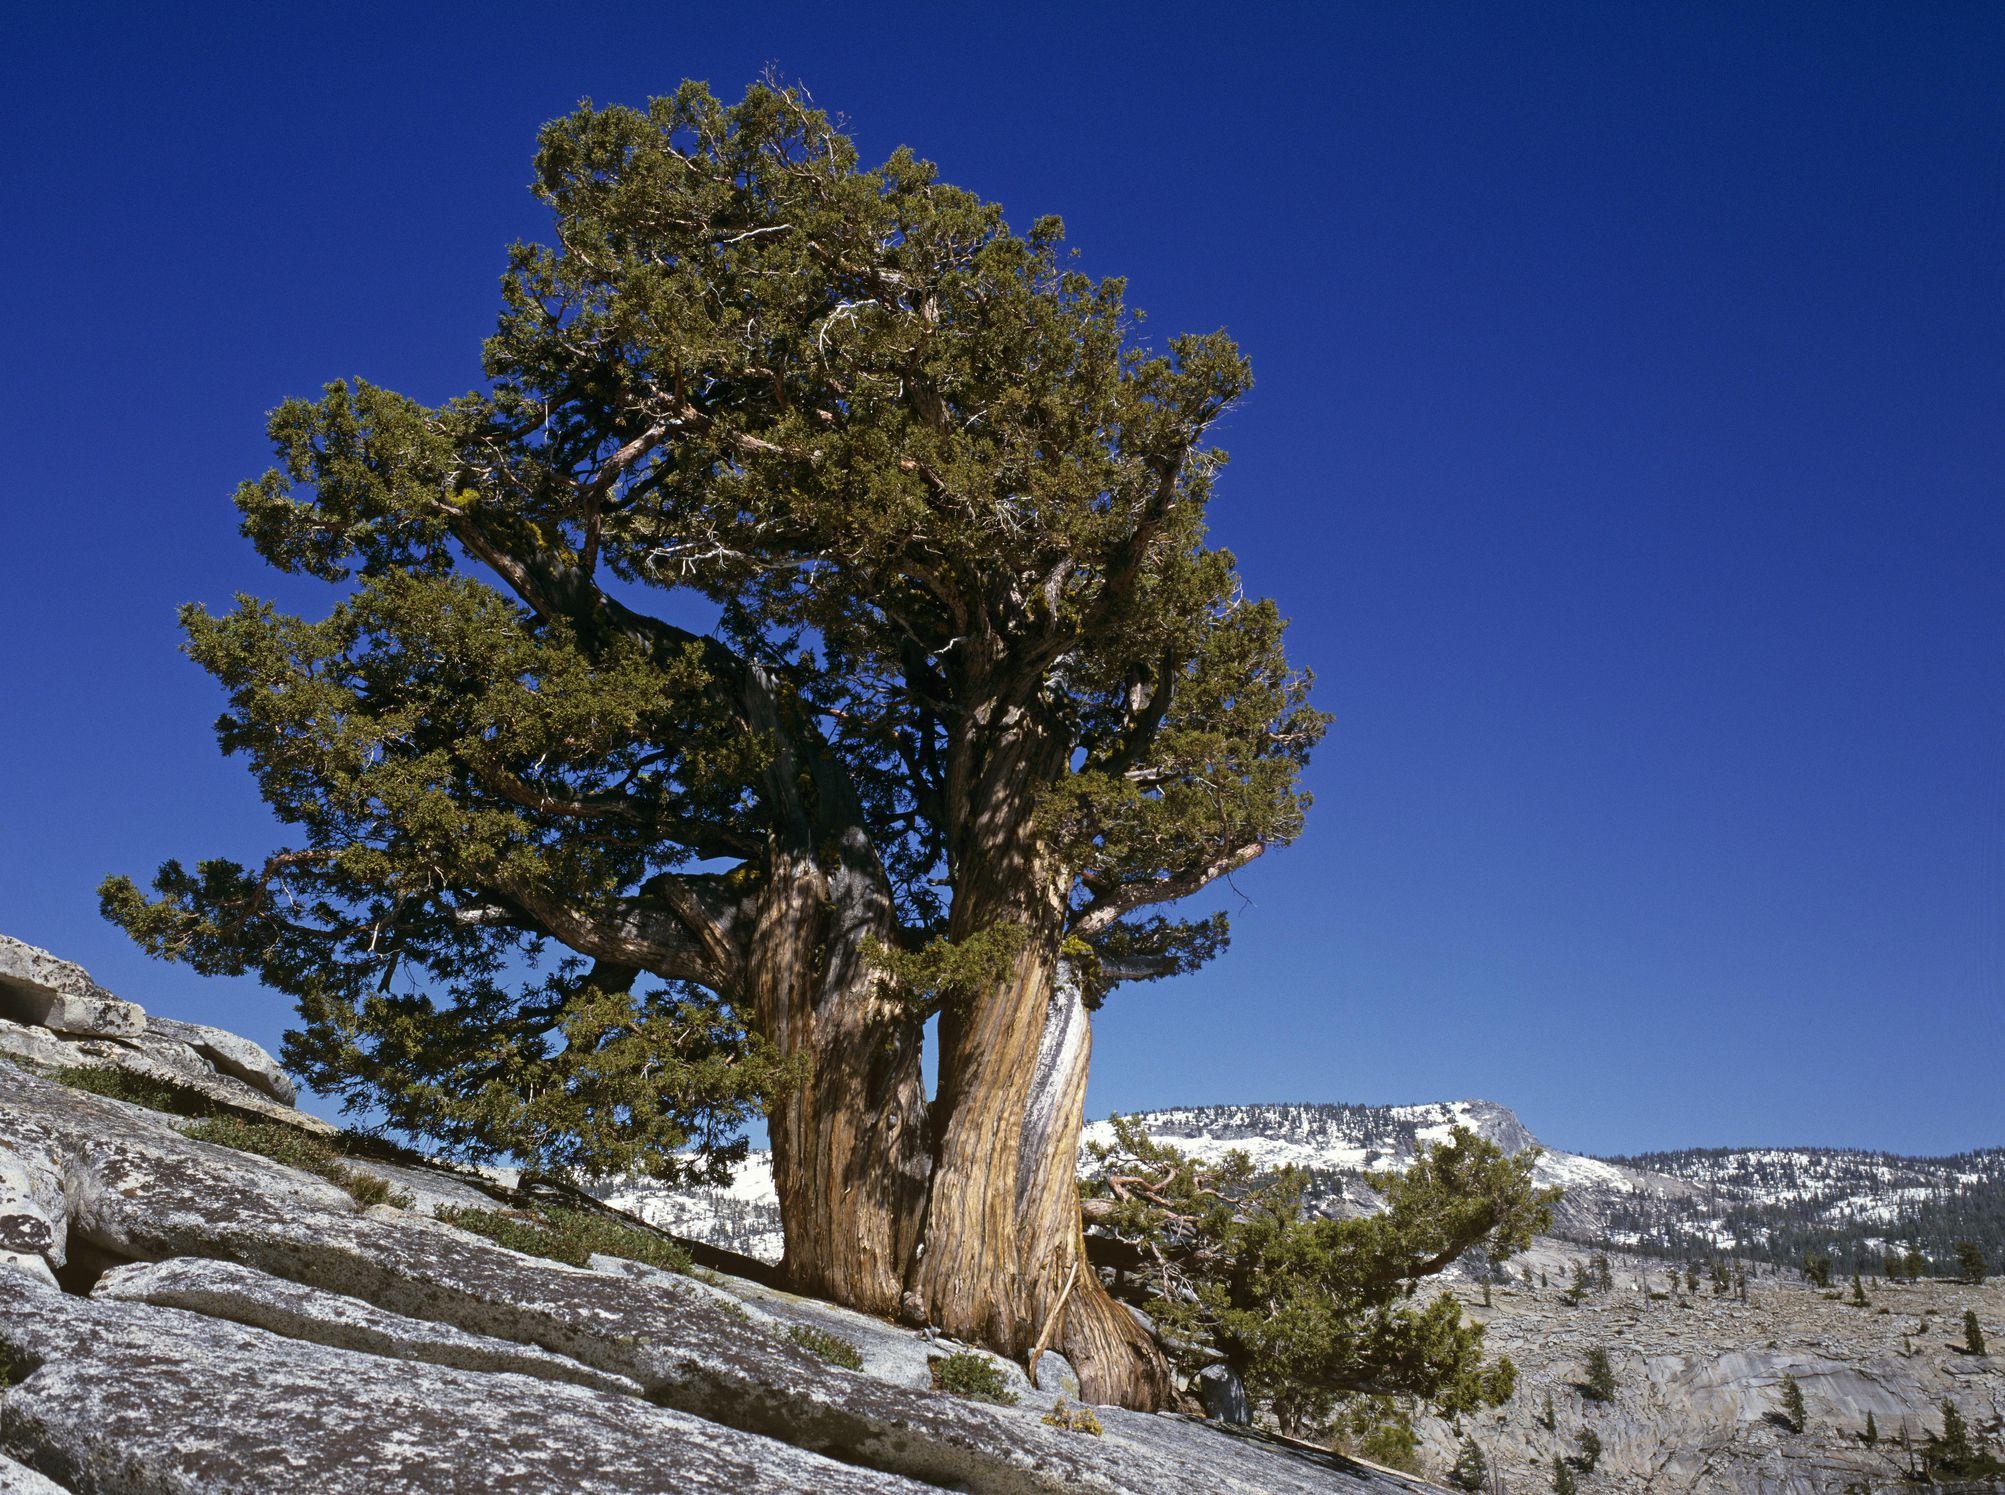 The Long Living Bristlecone Pine Trees